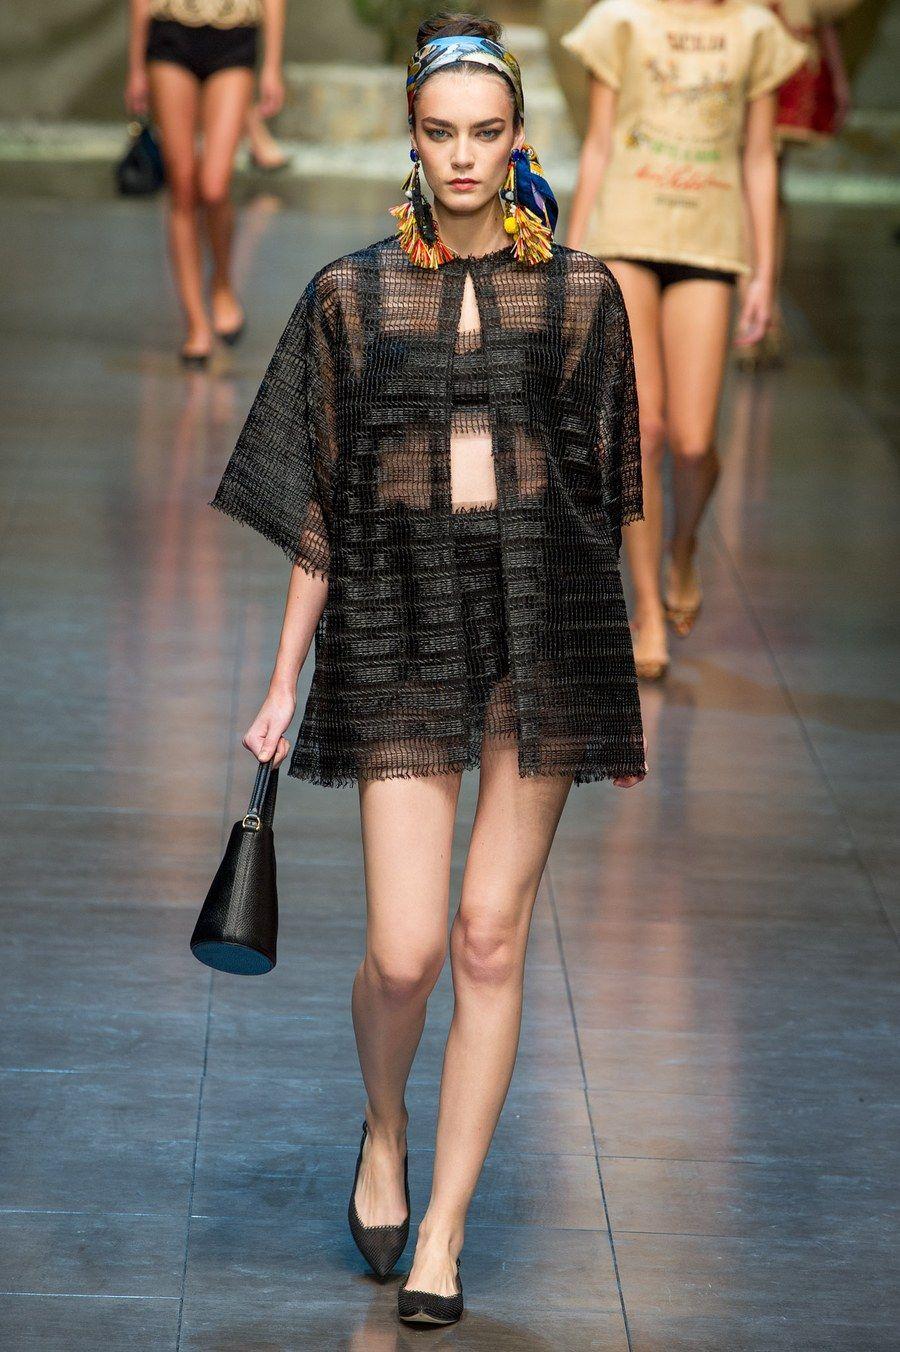 b8600ce8d940 Dolce   Gabbana Spring 2013 Ready-to-Wear Fashion Show in 2019 ...